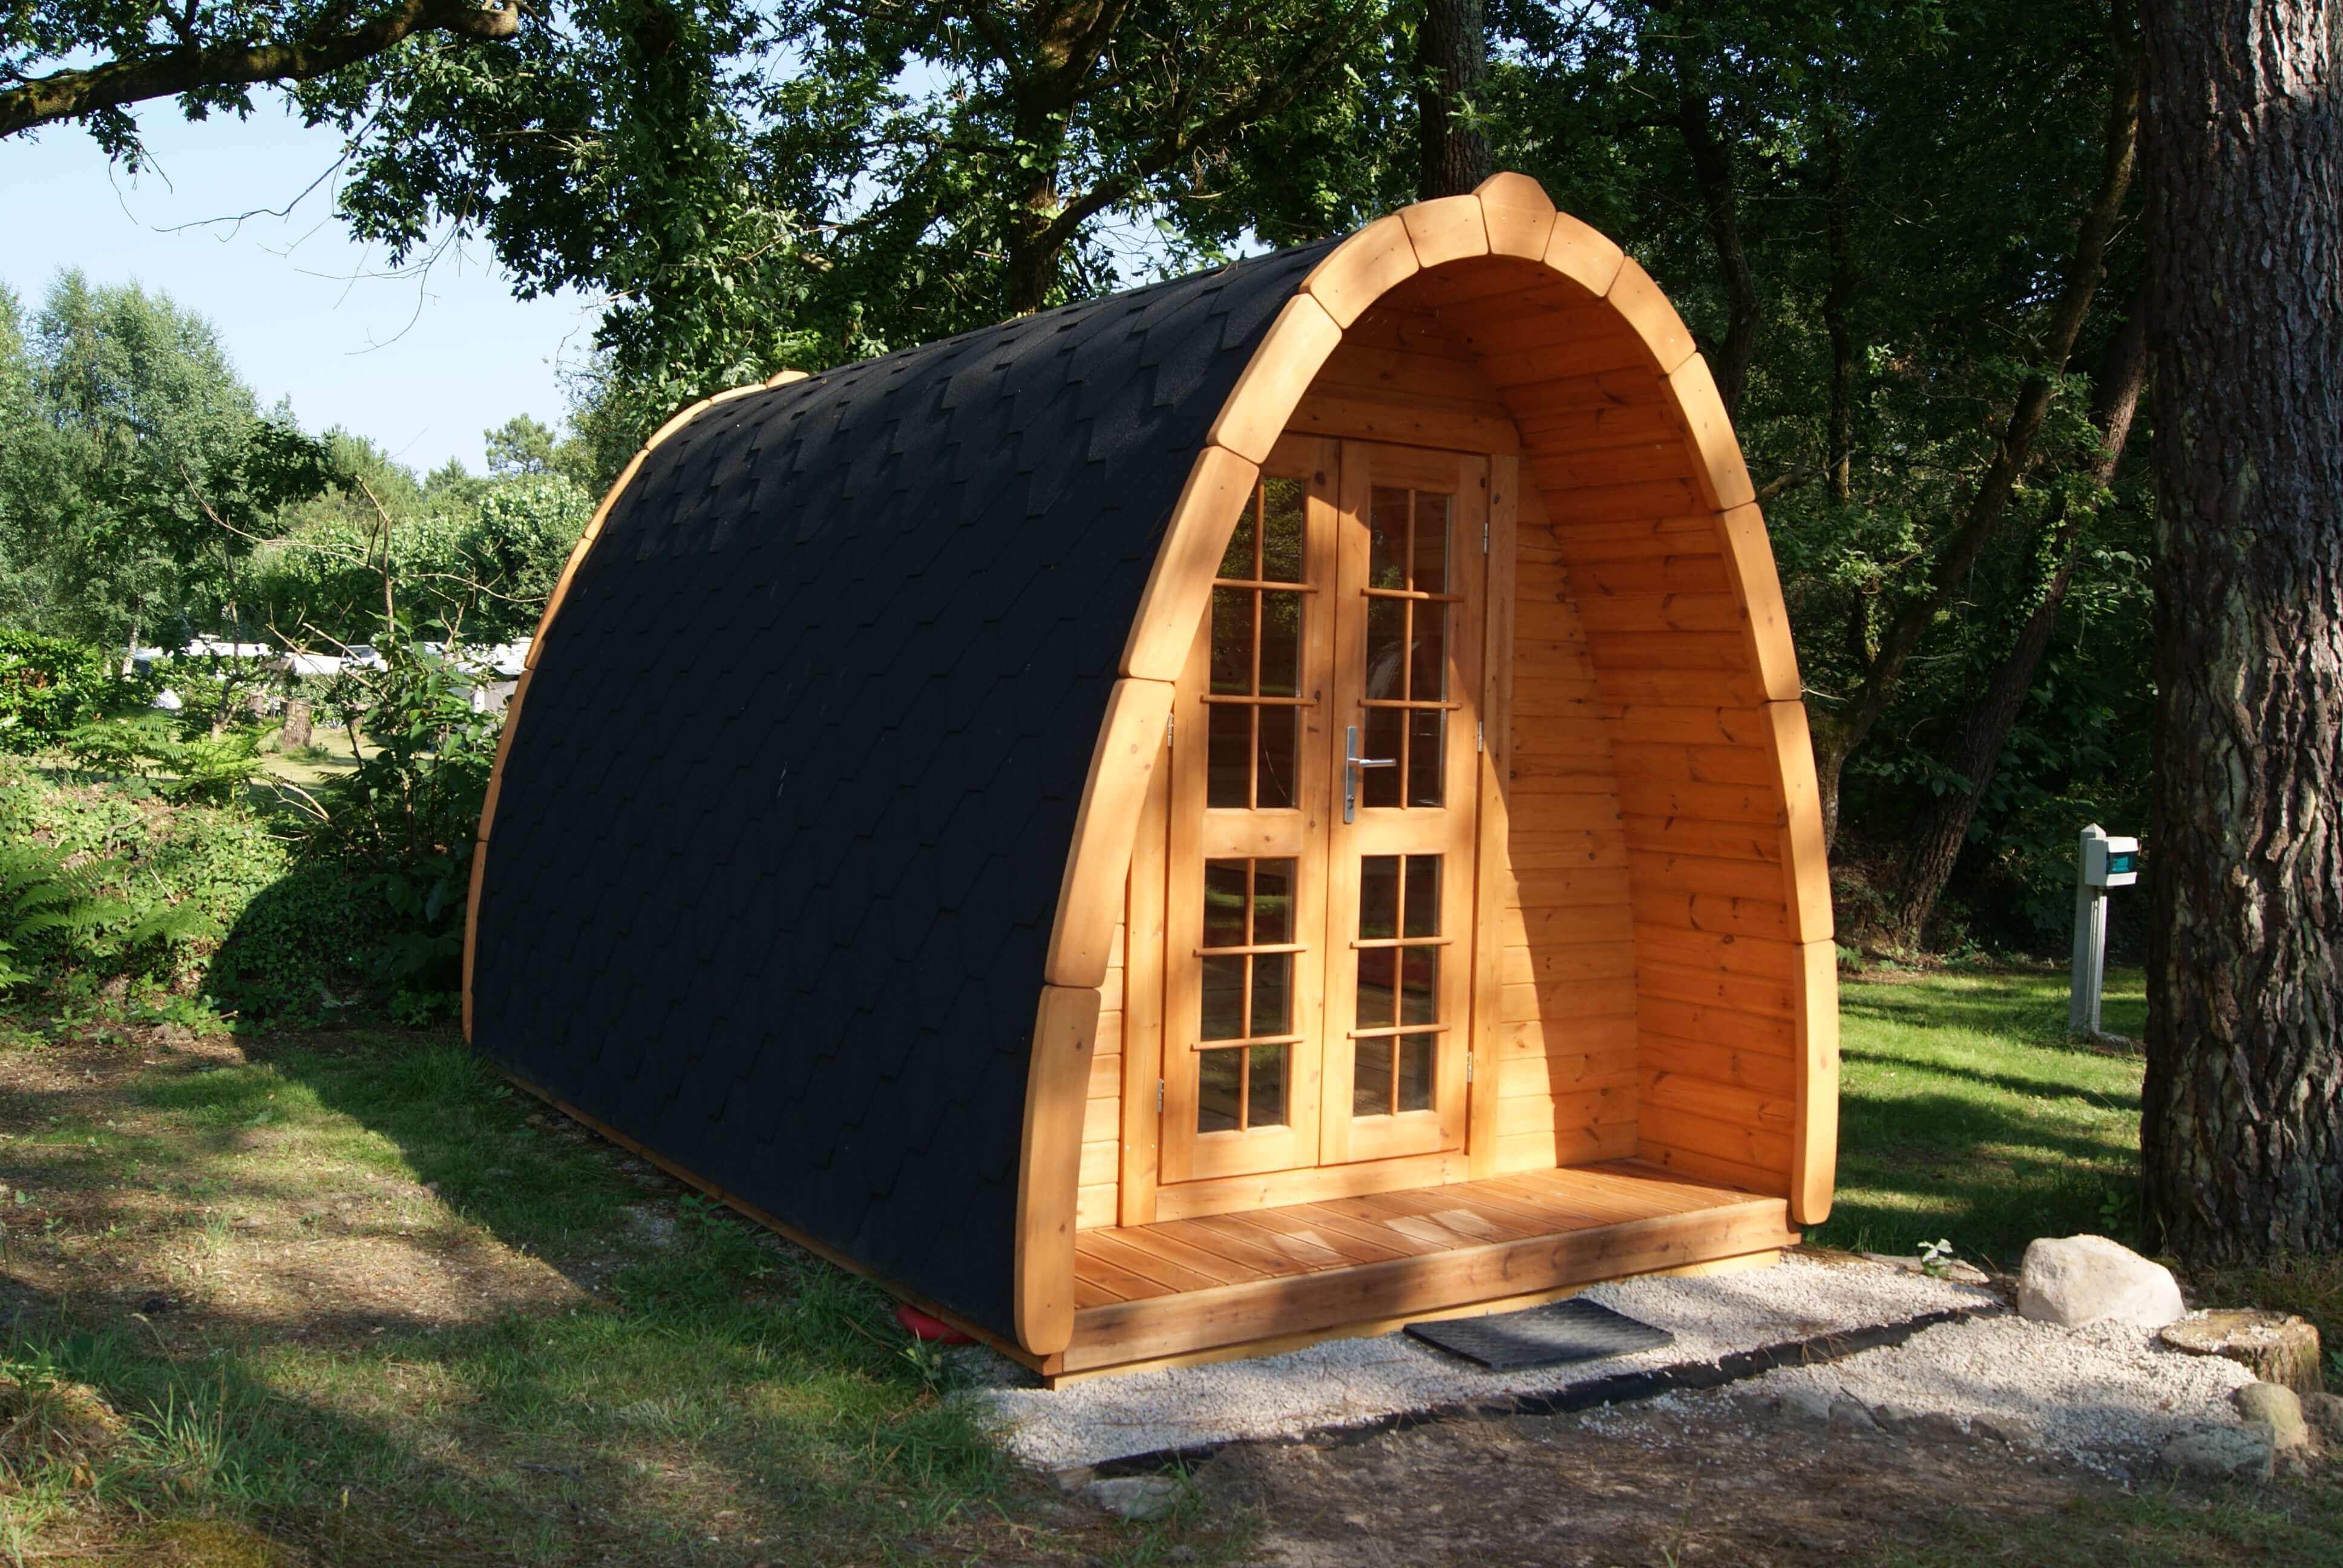 cabane en bois pod extérieur-camping de kergo-carnac-auray-ploemel-morbihan